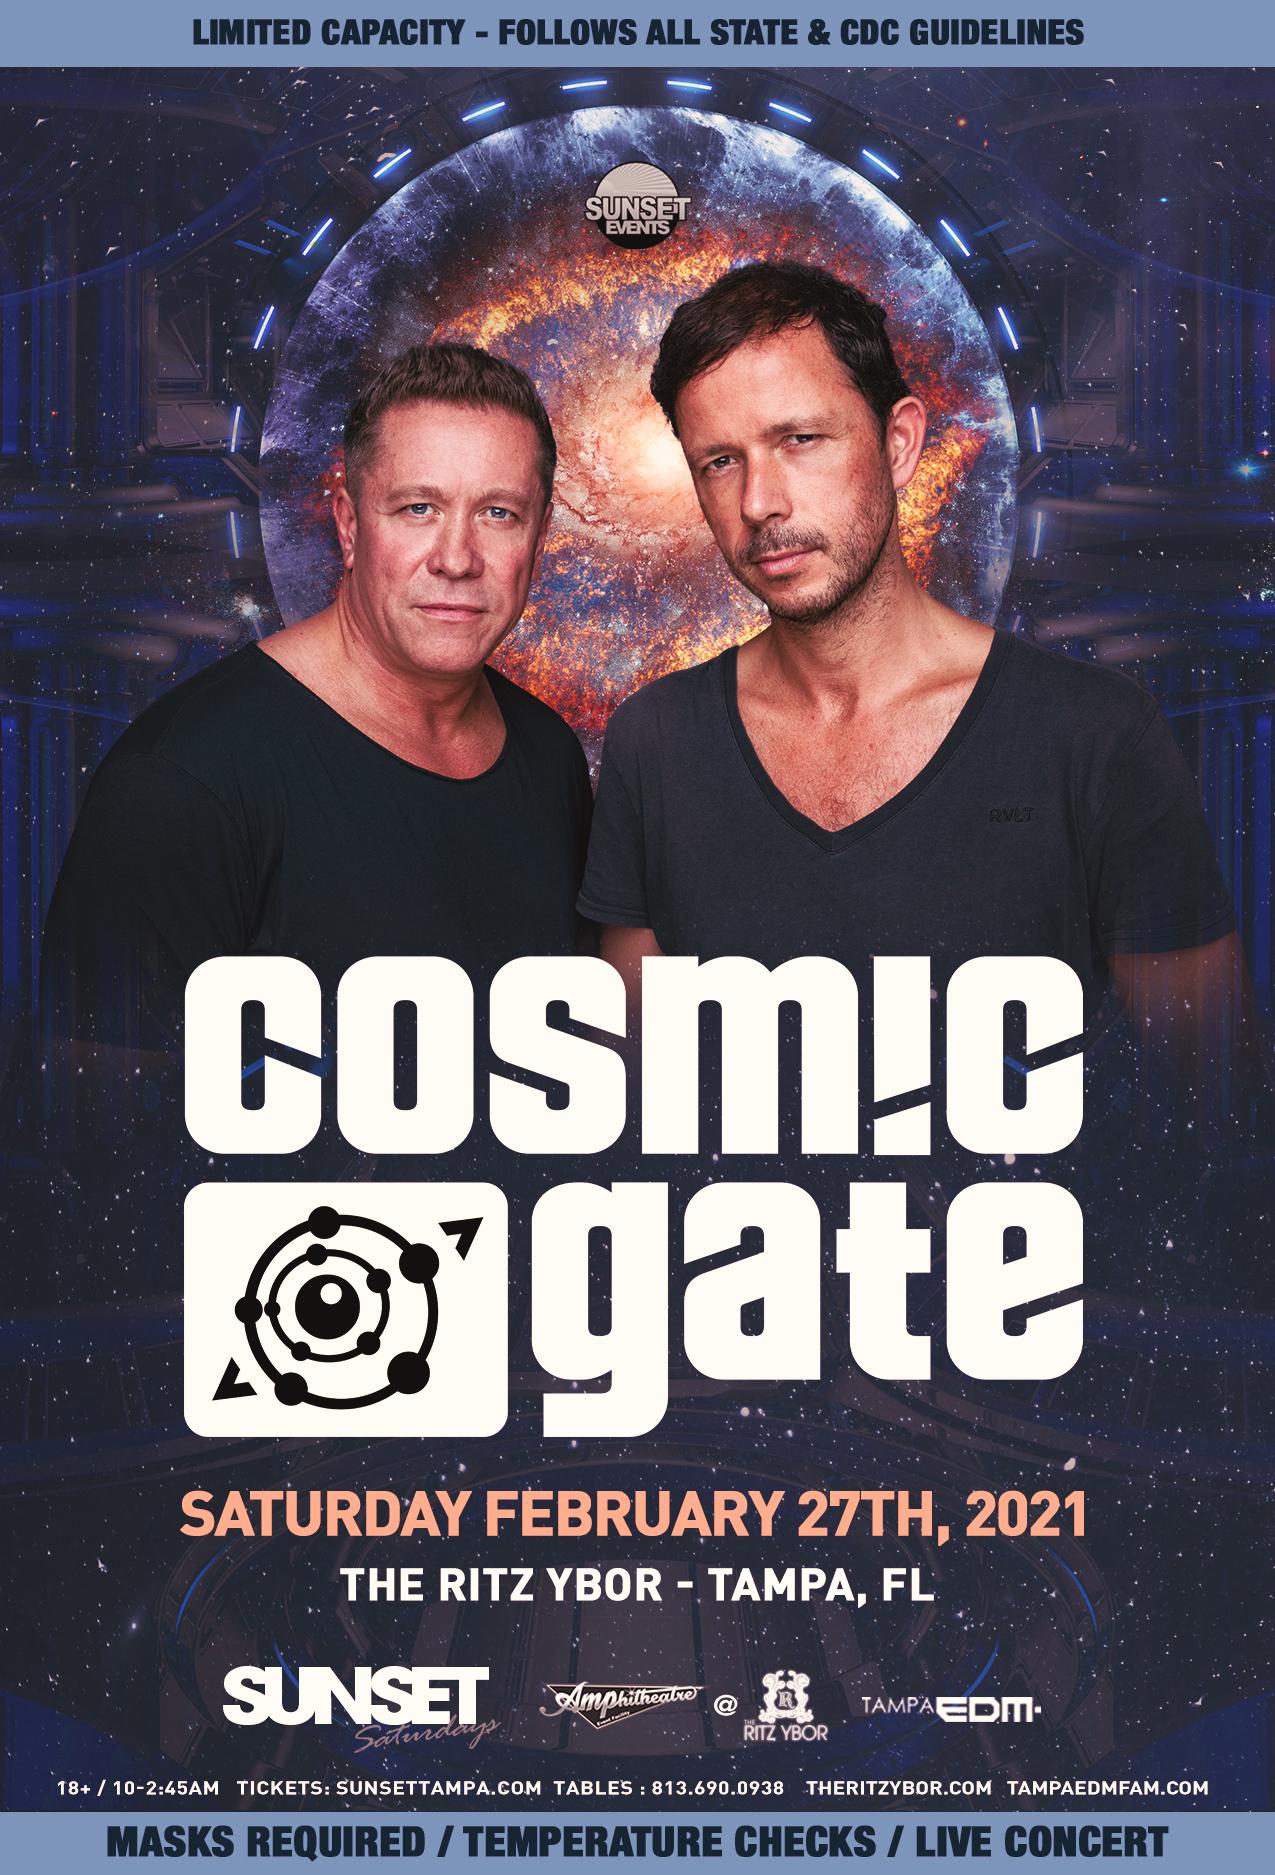 Cosmic Gate for Sunset Saturdays at The RITZ Ybor – 2/27/2021